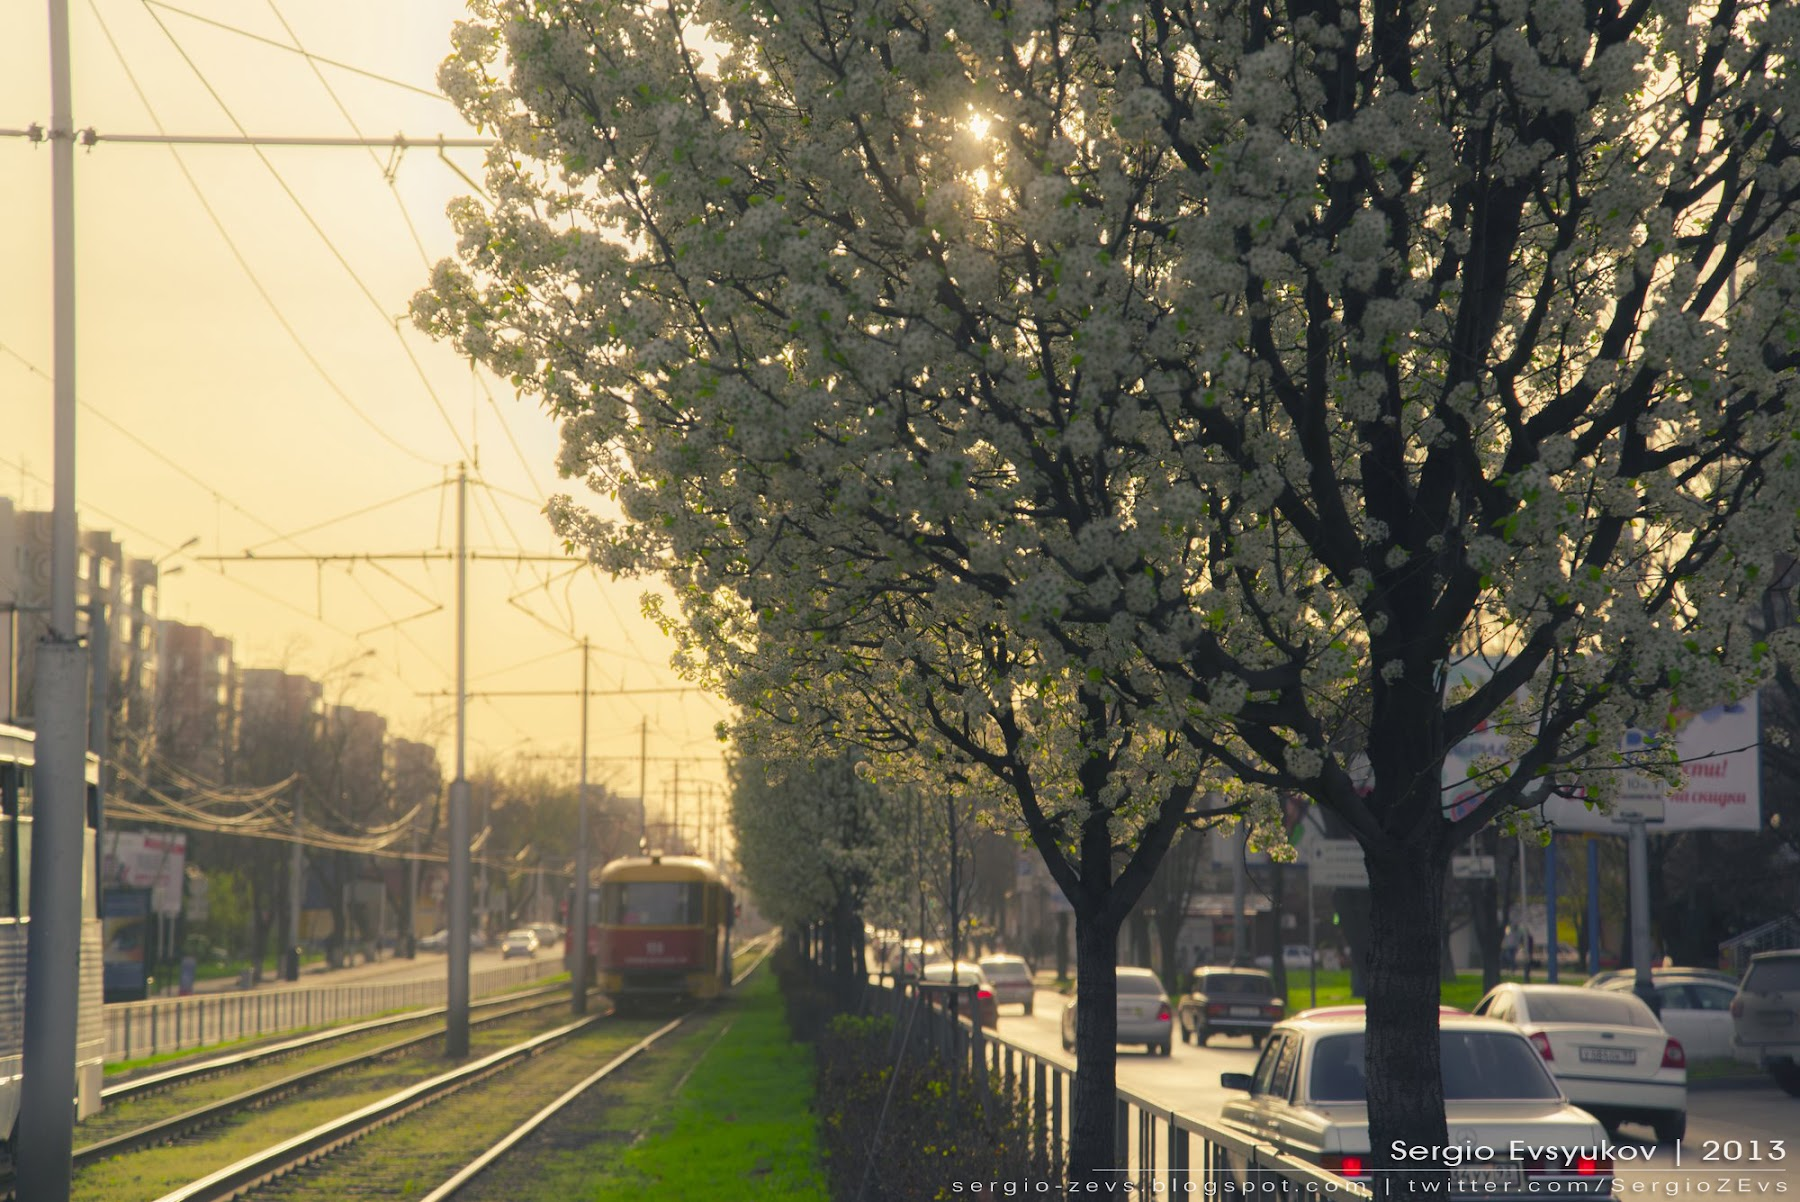 Ставропольская, Краснодар, закат, весна, Бульвар